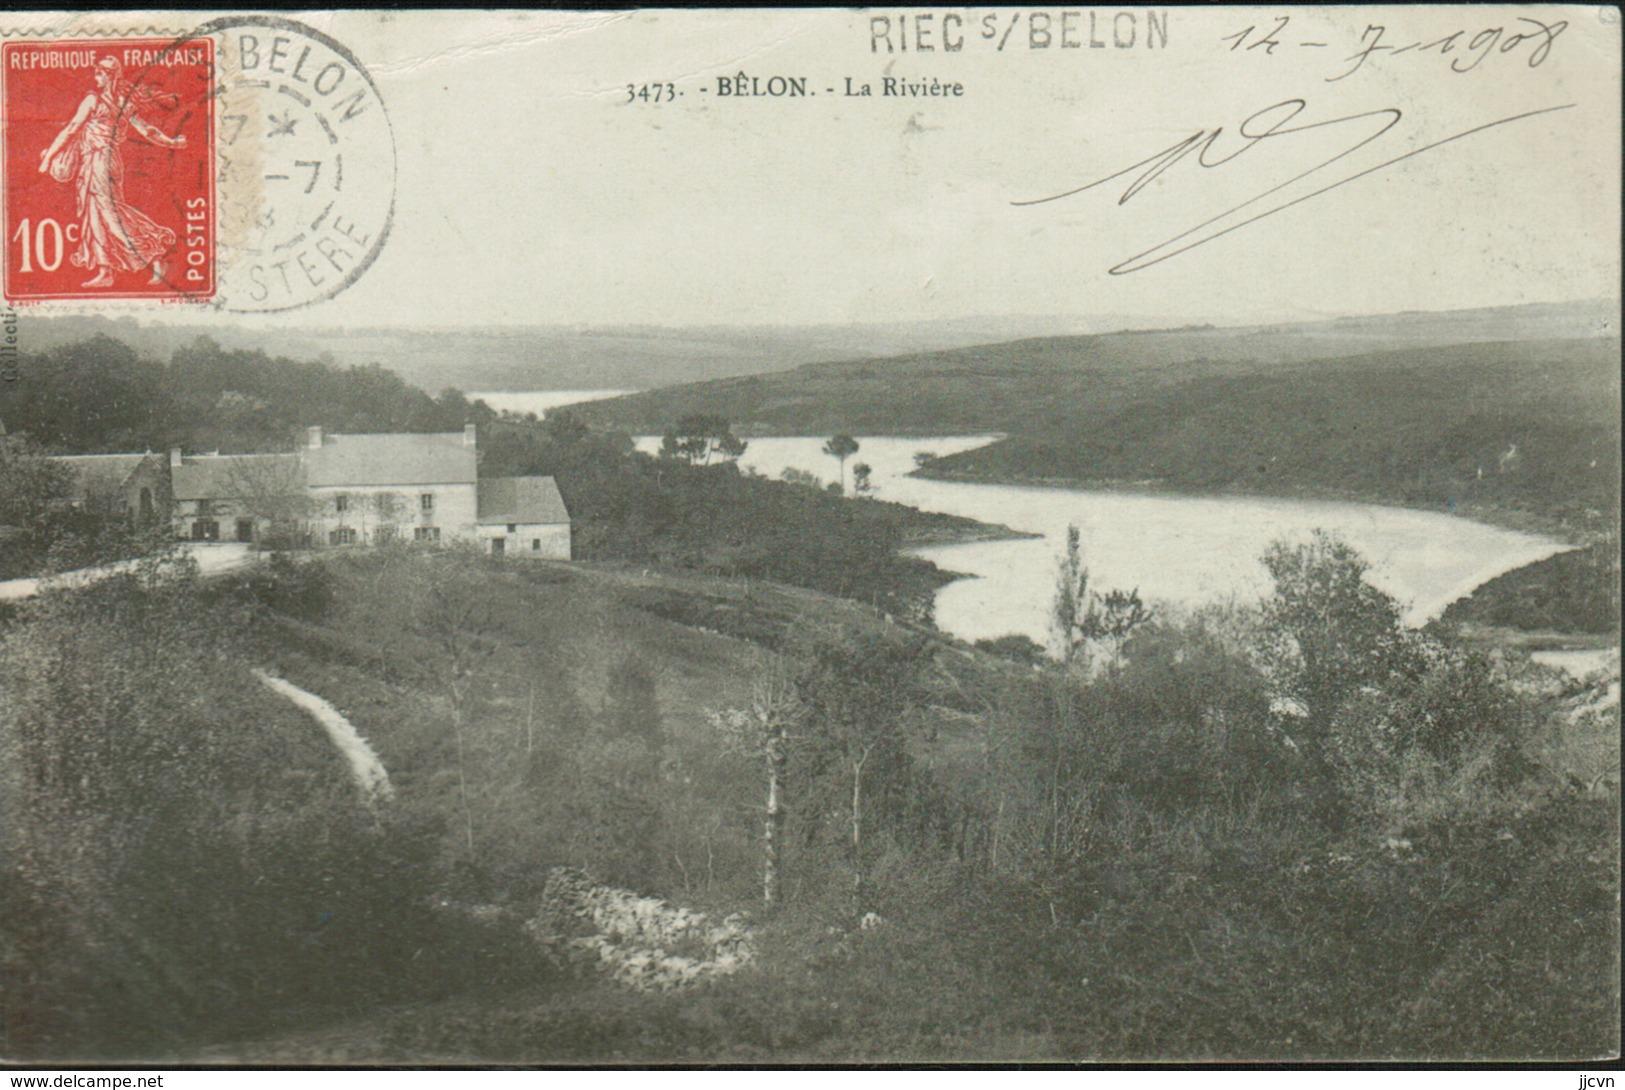 Belon - La Rivière - France